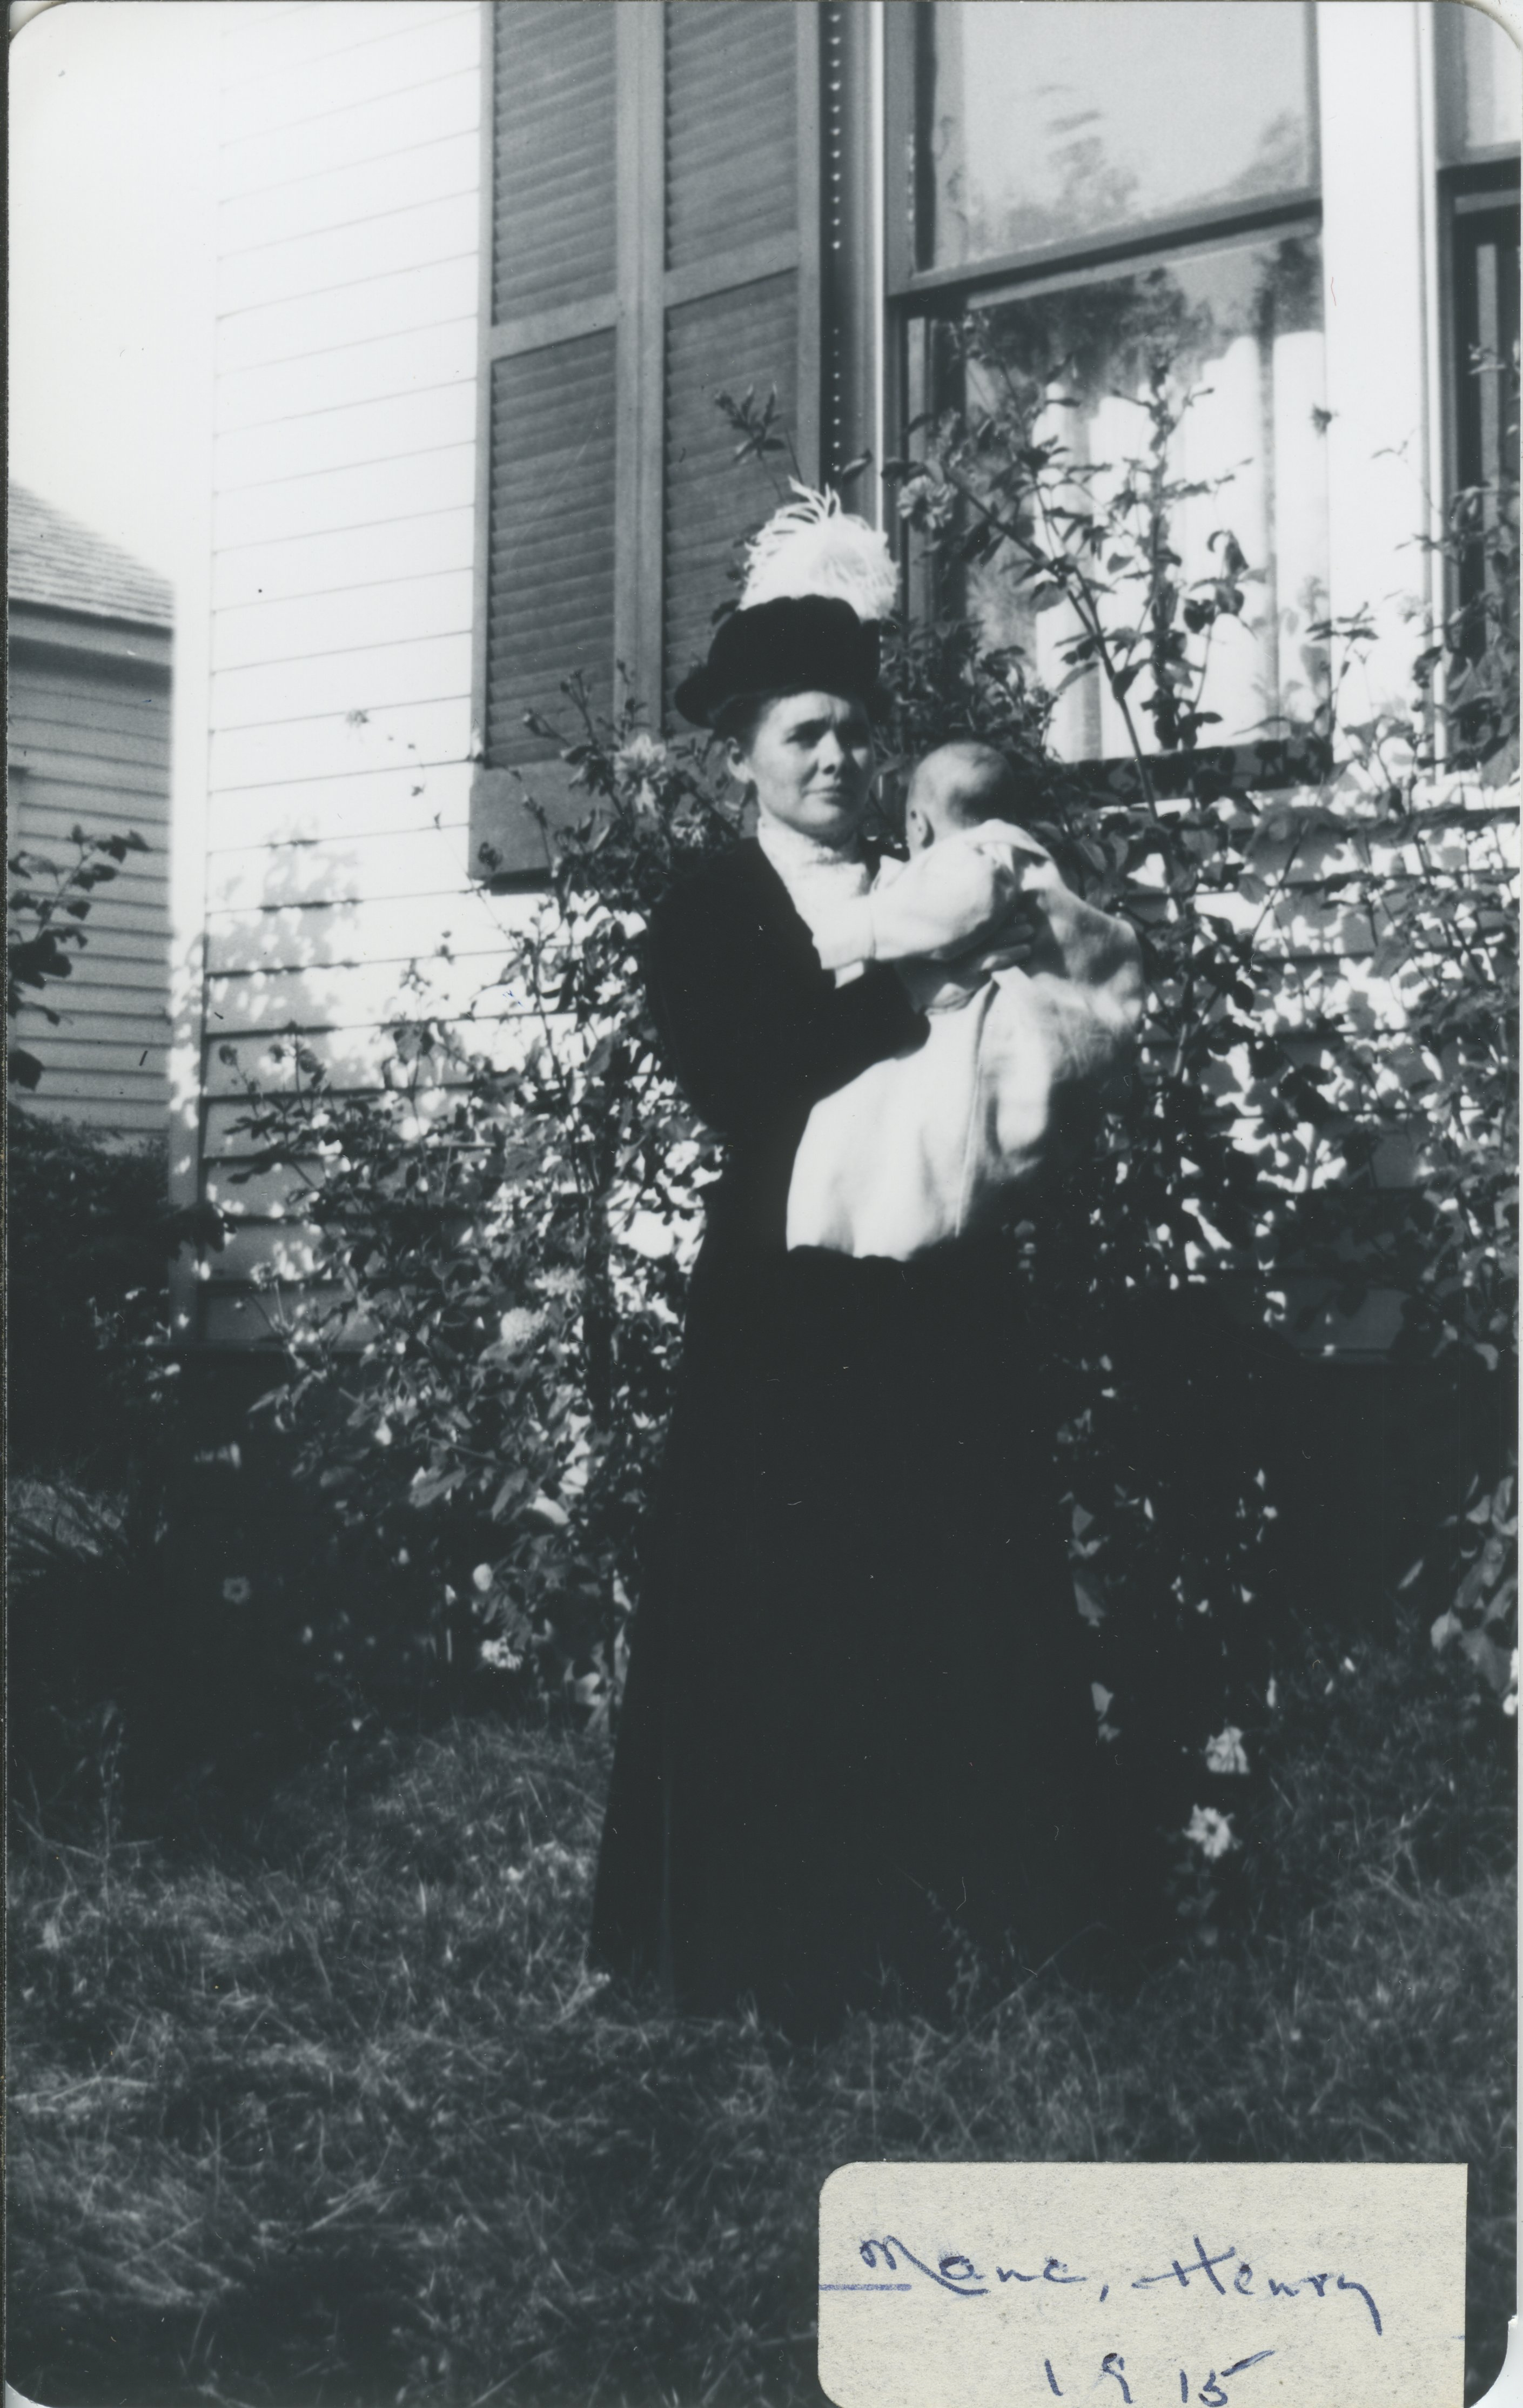 Mama Henry Circa